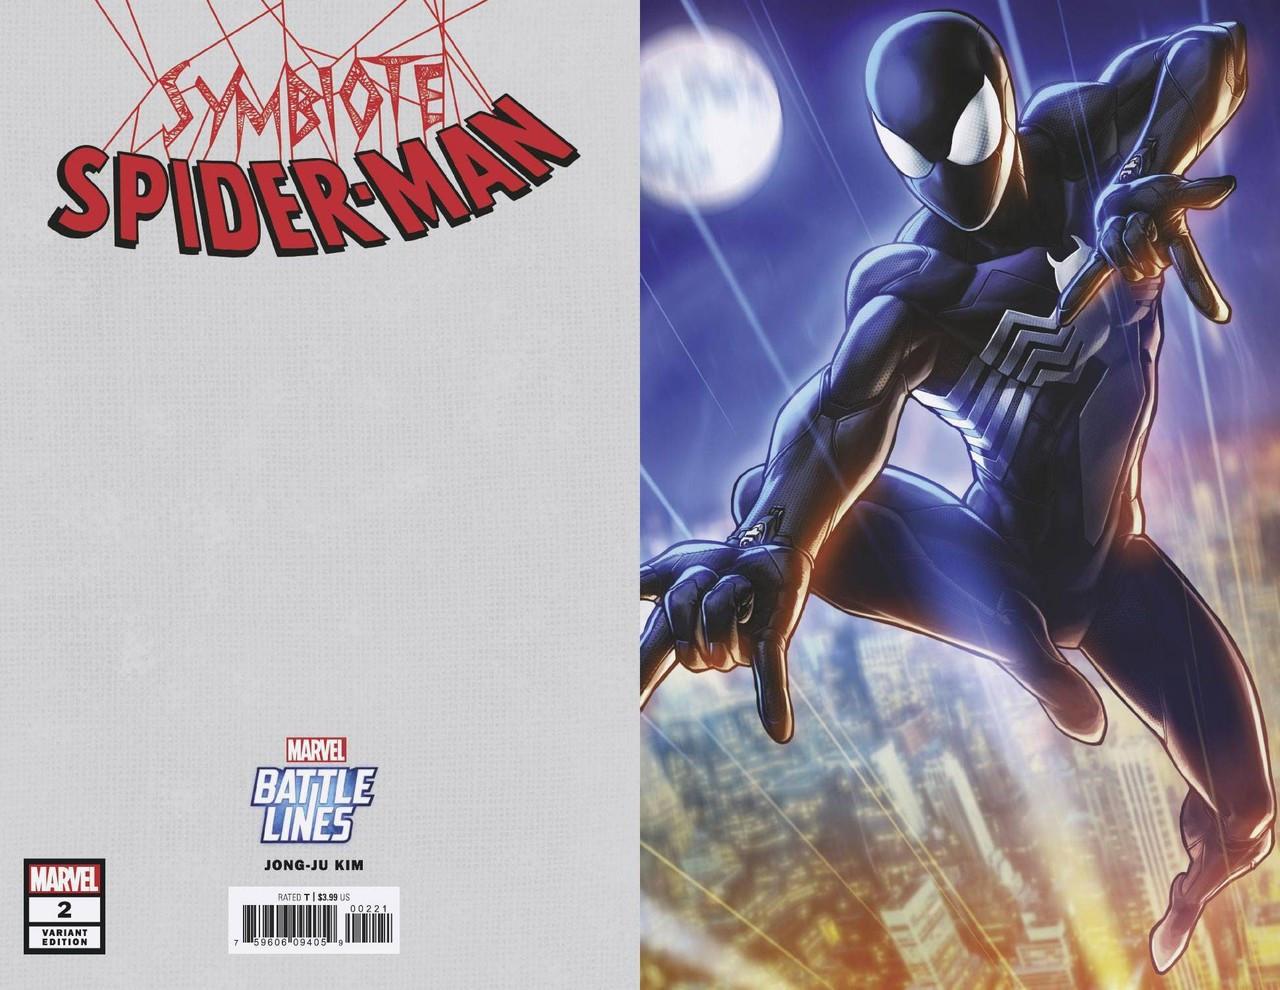 SYMBIOTE SPIDER-MAN #1 MAIN /& ARTGERM RON LIM VARIANT COVER SET 3 MARVEL COMICS